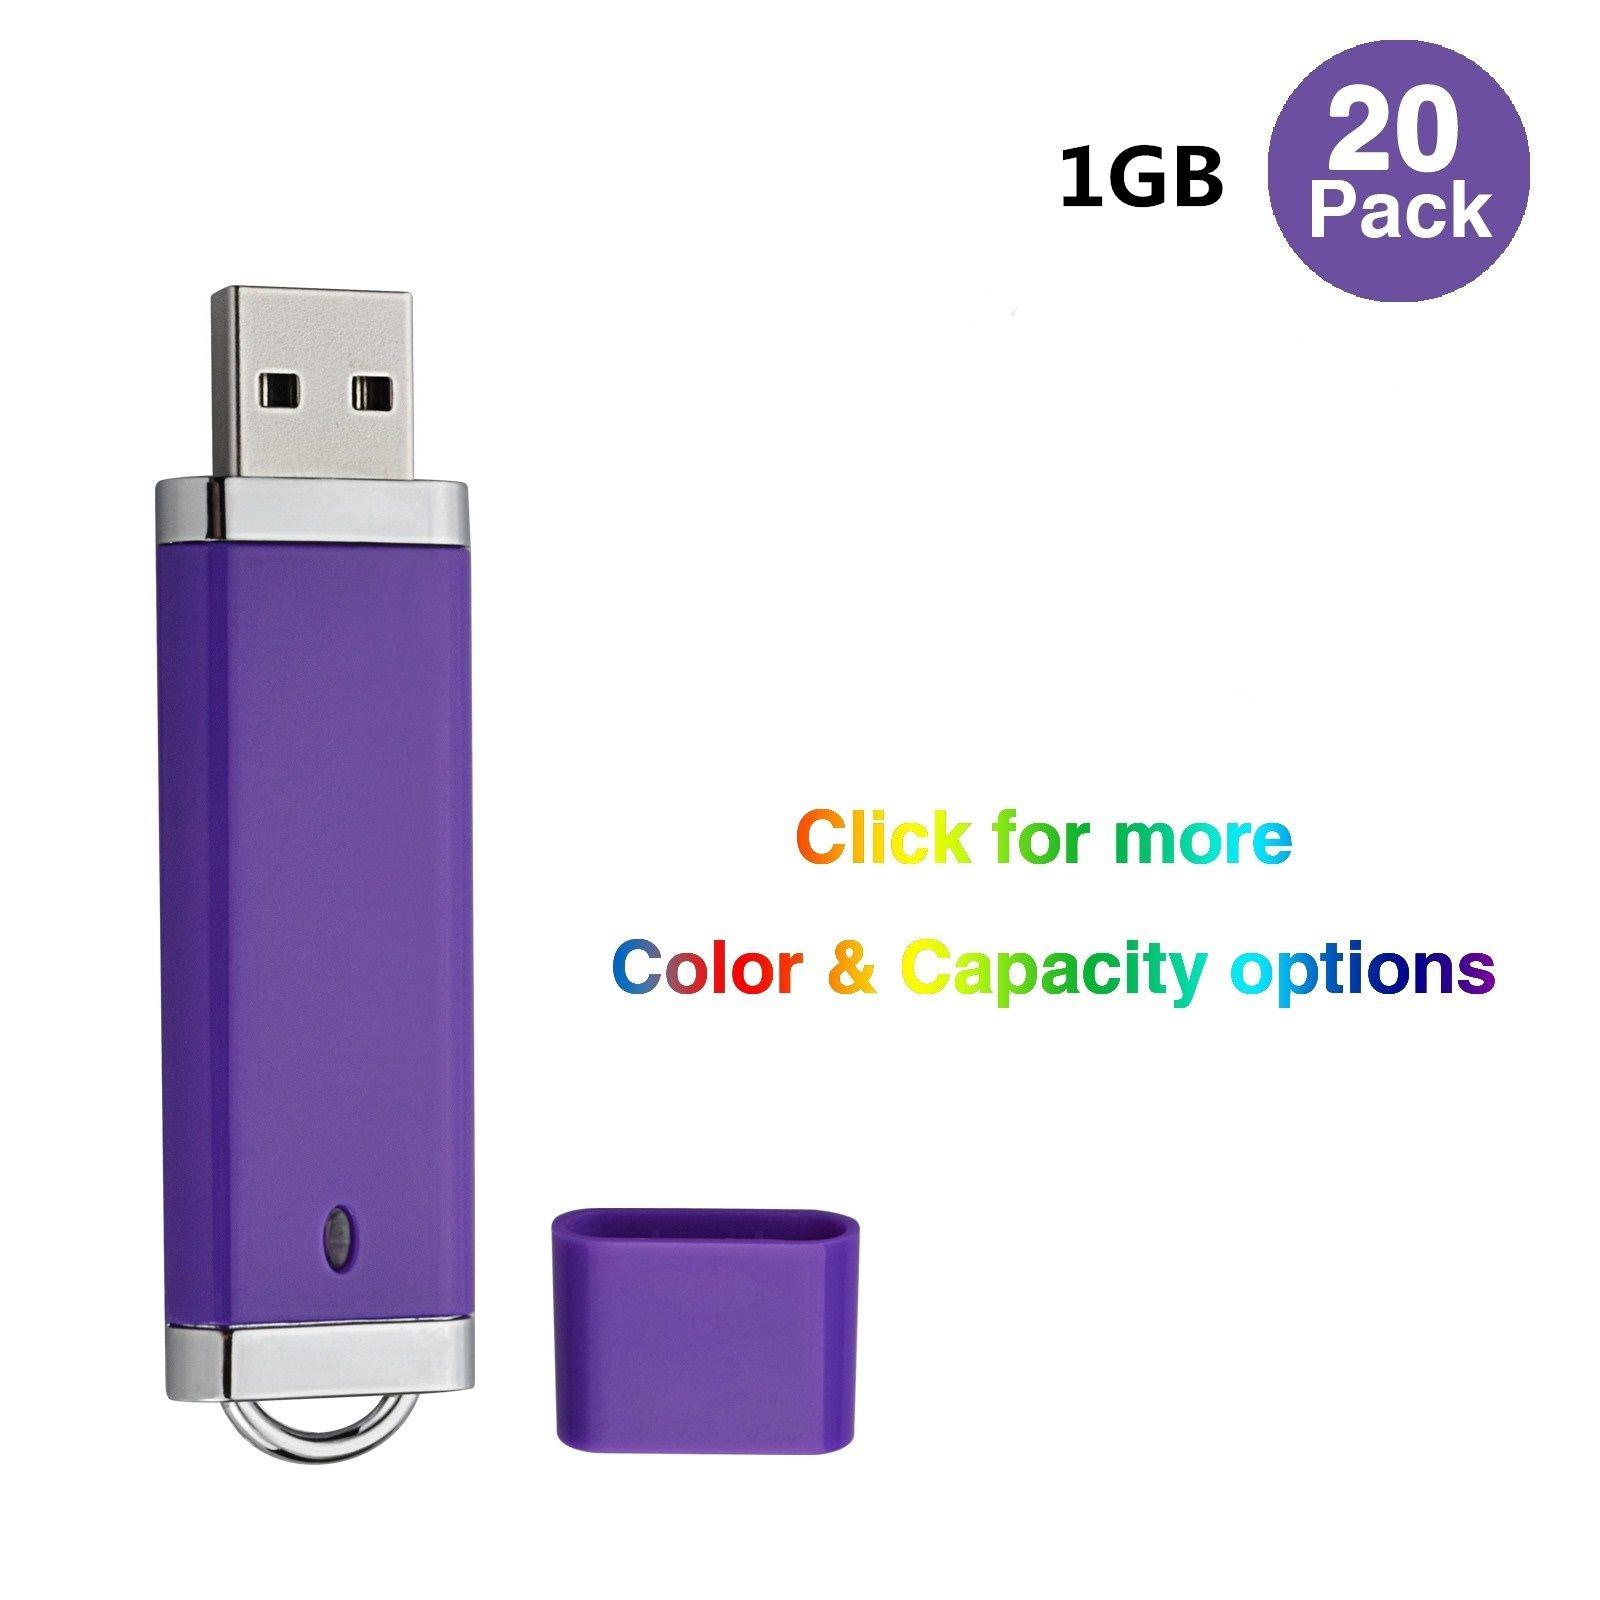 20 Pack Purple Lighter Model 64MB-32GB USB 2.0 Flash Drives Flash Pen Drives Memory Stick for Computer Laptop Thumb Storage LED Indicator